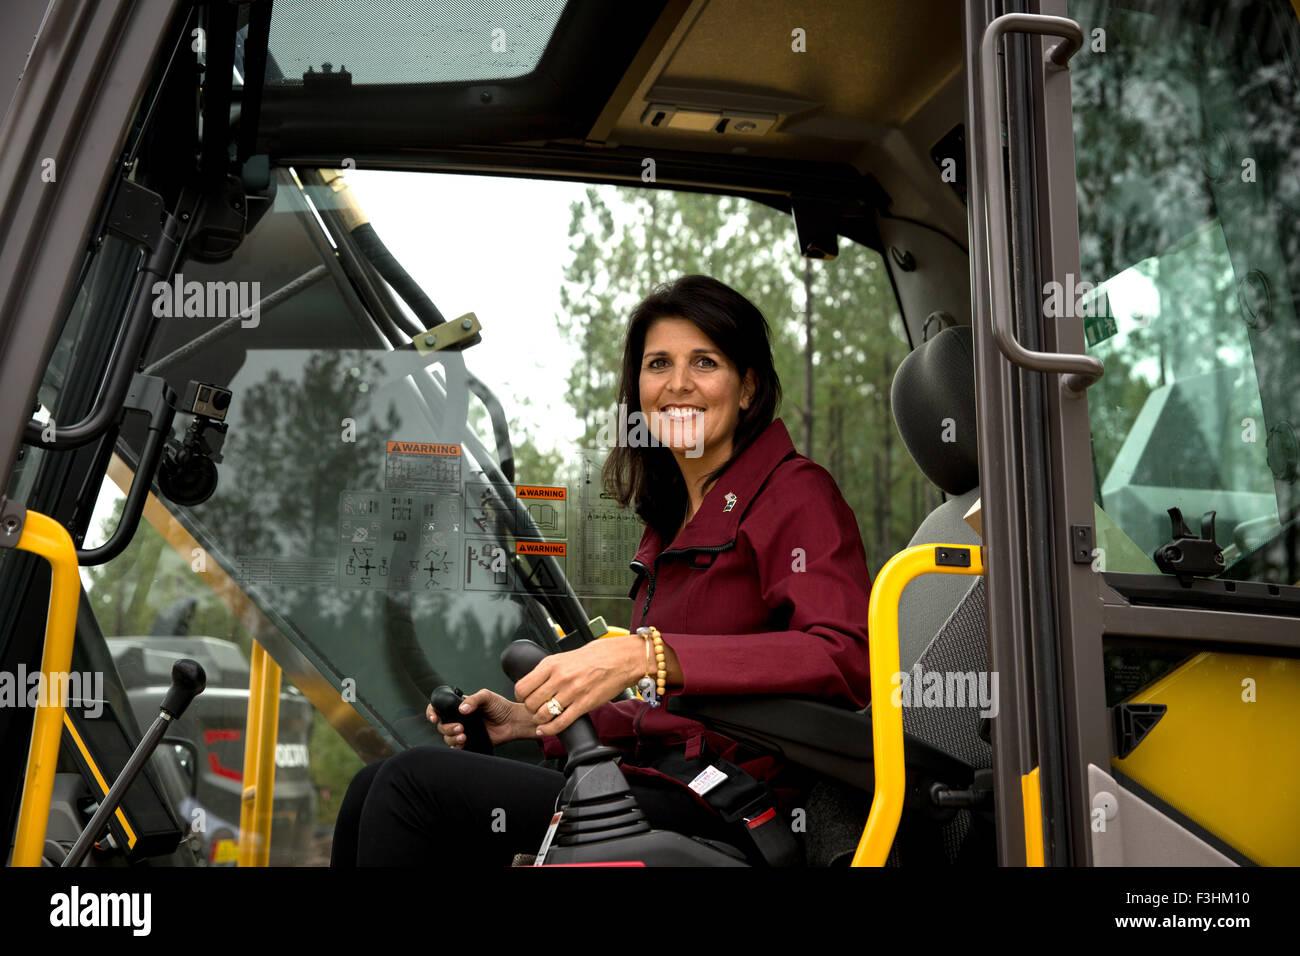 South Carolina Governor Nikki Haley Behind The Controls Of An